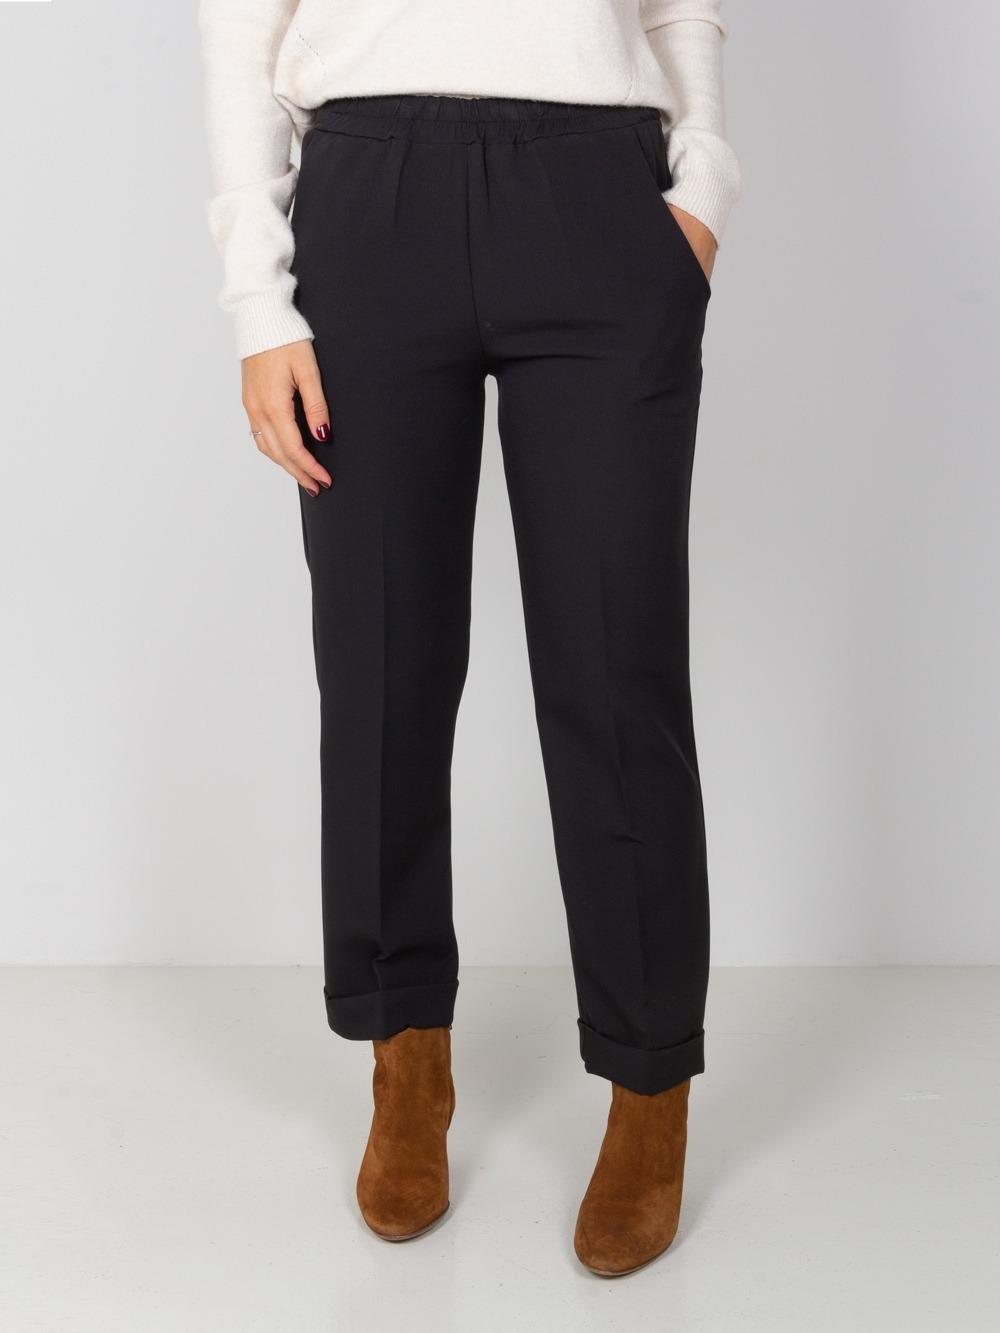 Pantalón mujer wide leg cintura elastica Negro